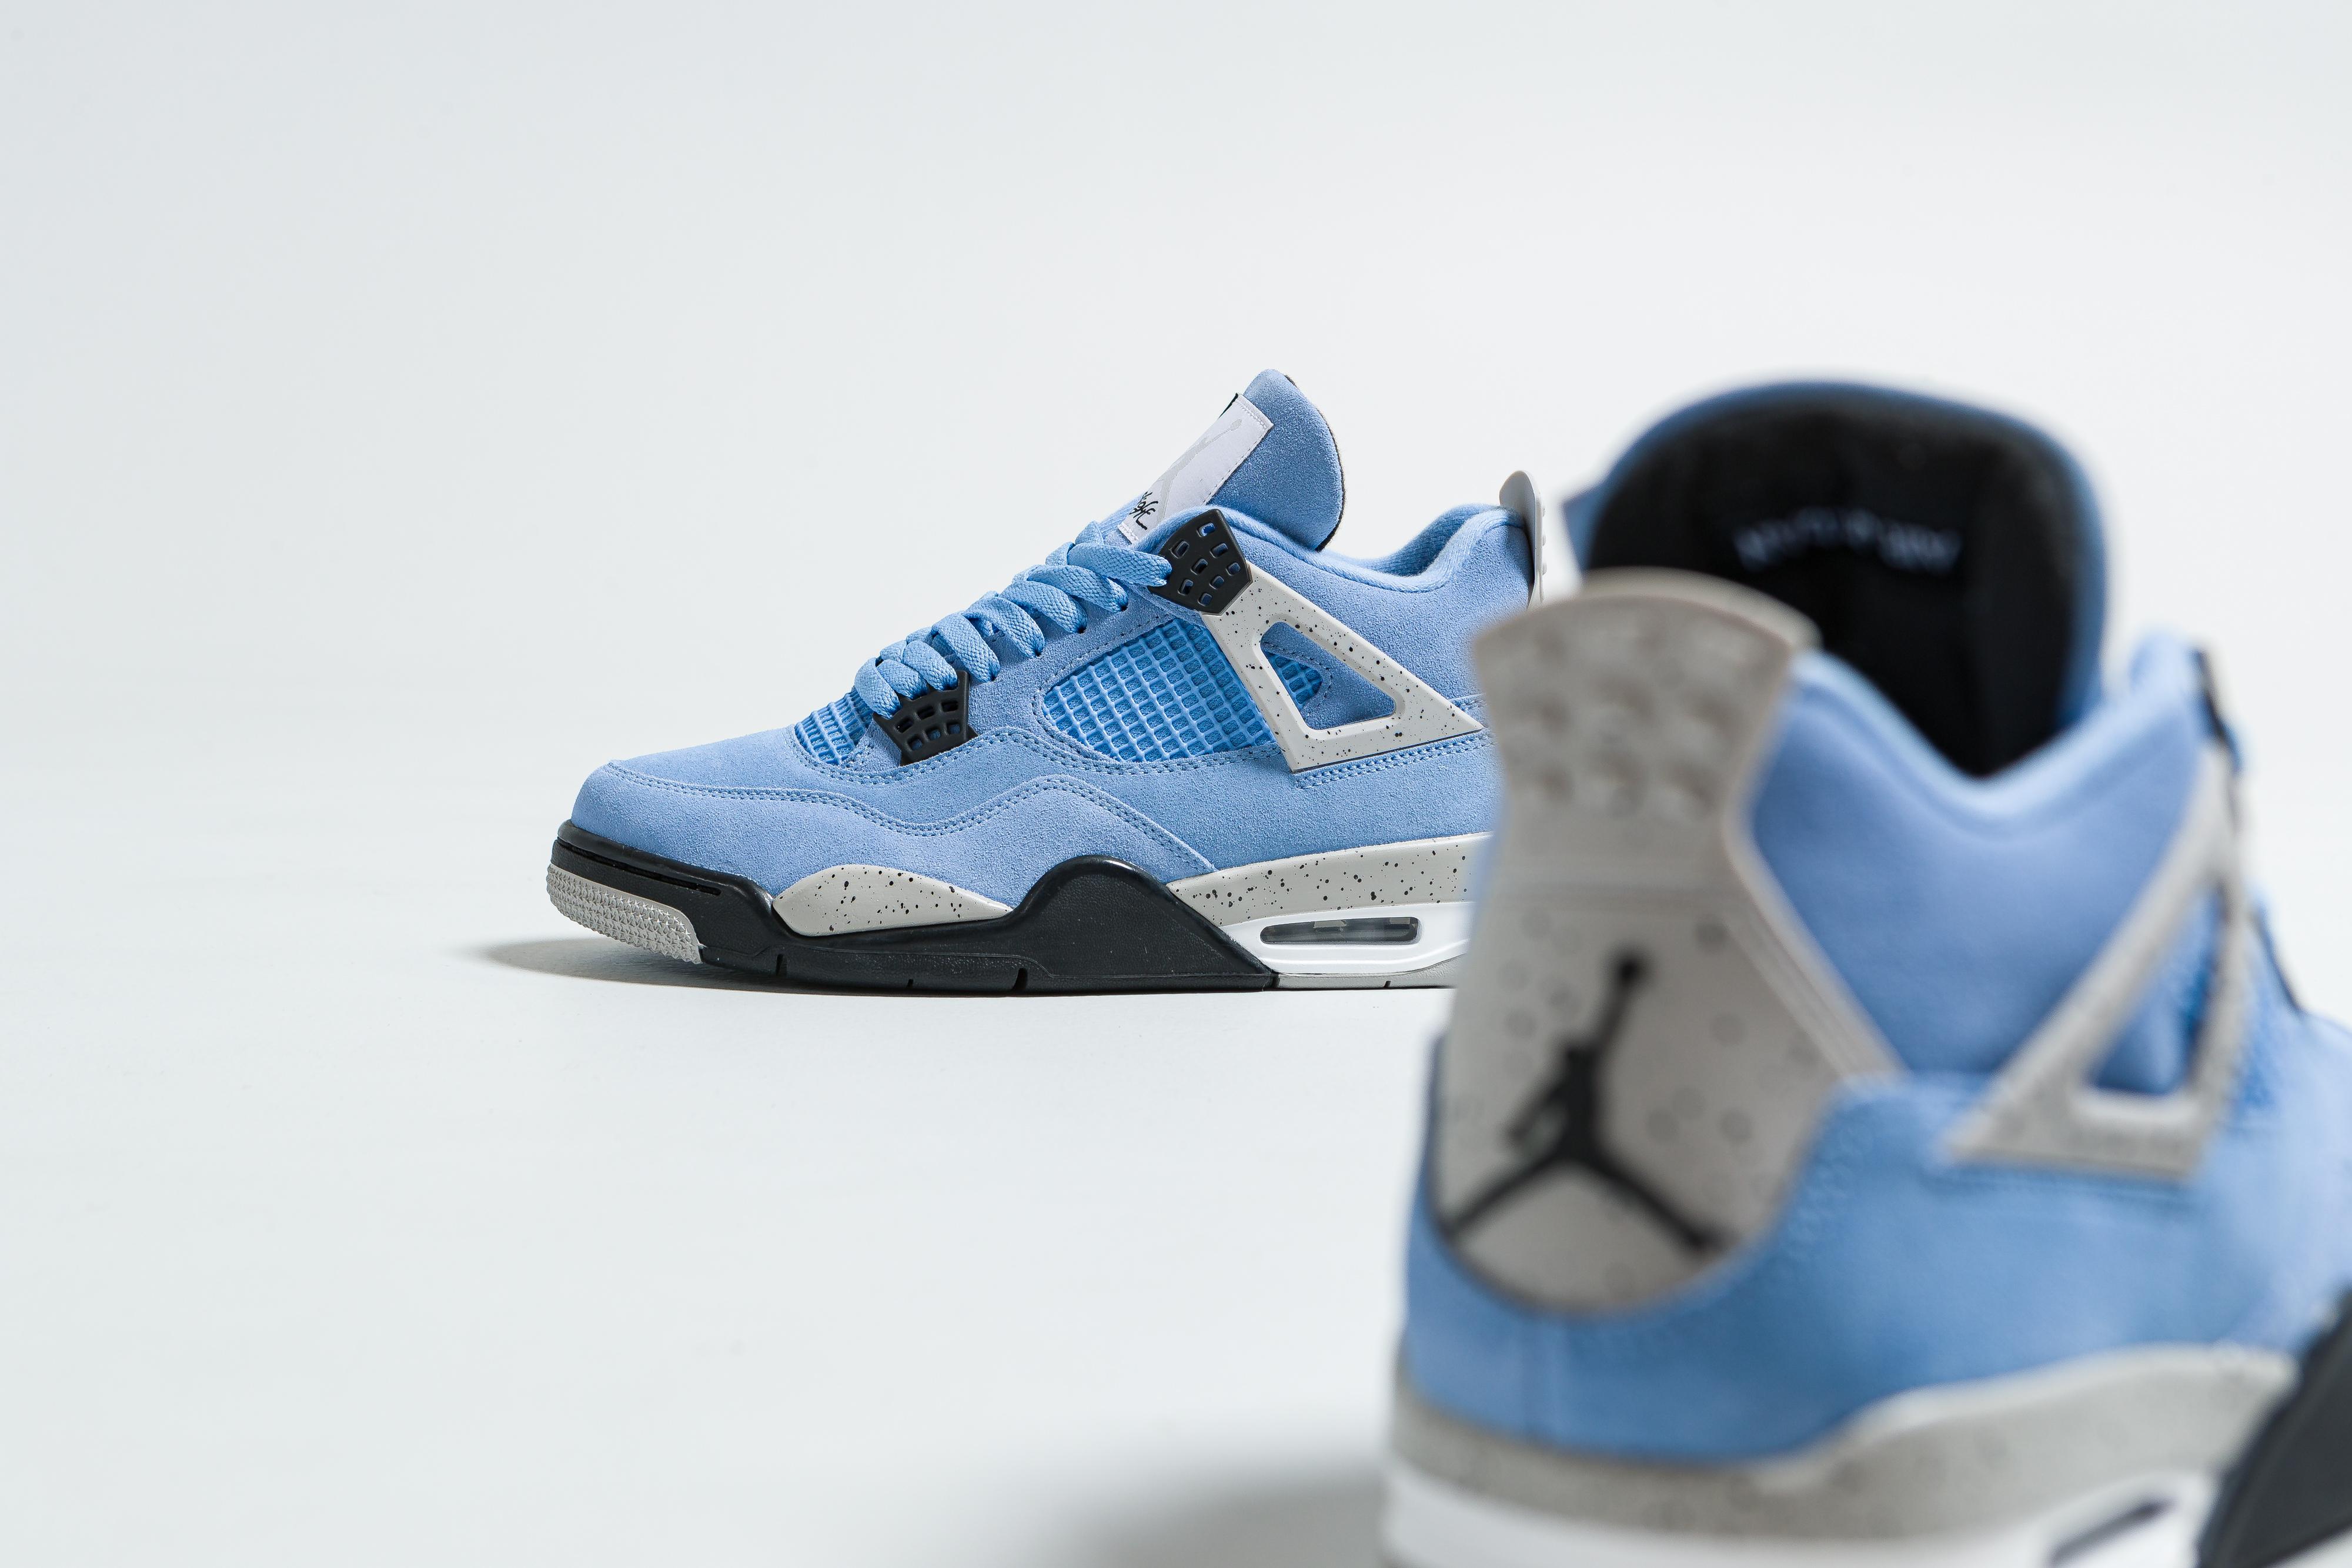 Up There Launches - Nike Air Jordan 4 Retro 'University Blue'